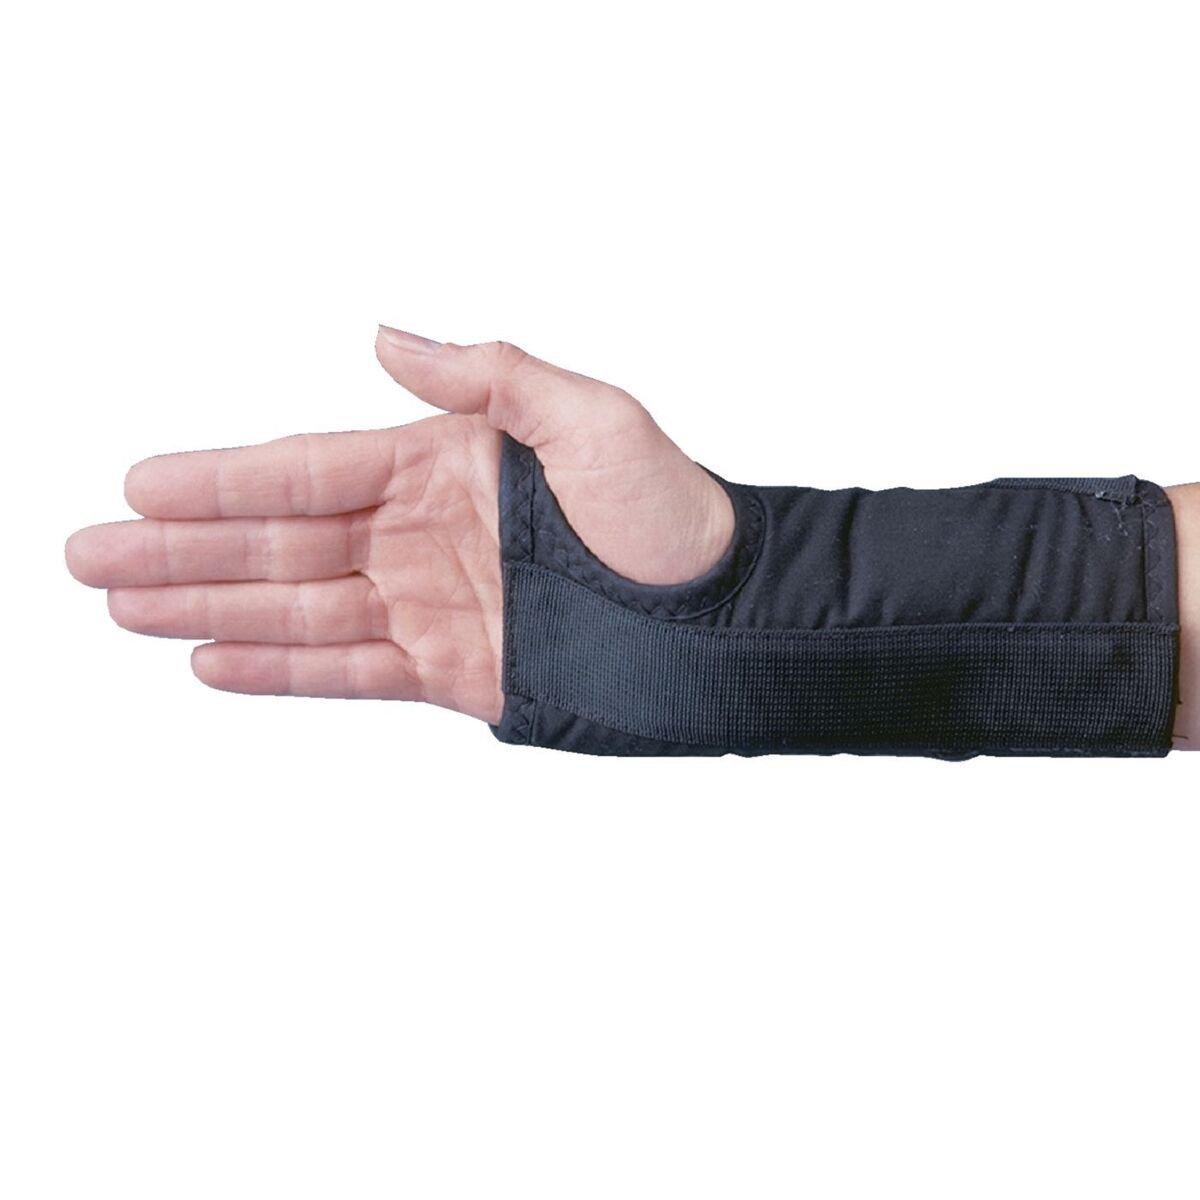 Rolyan D-Ring Right Wrist Brace Large Size Fits Wrists Oklahoma City Mall Max 45% OFF 7.75